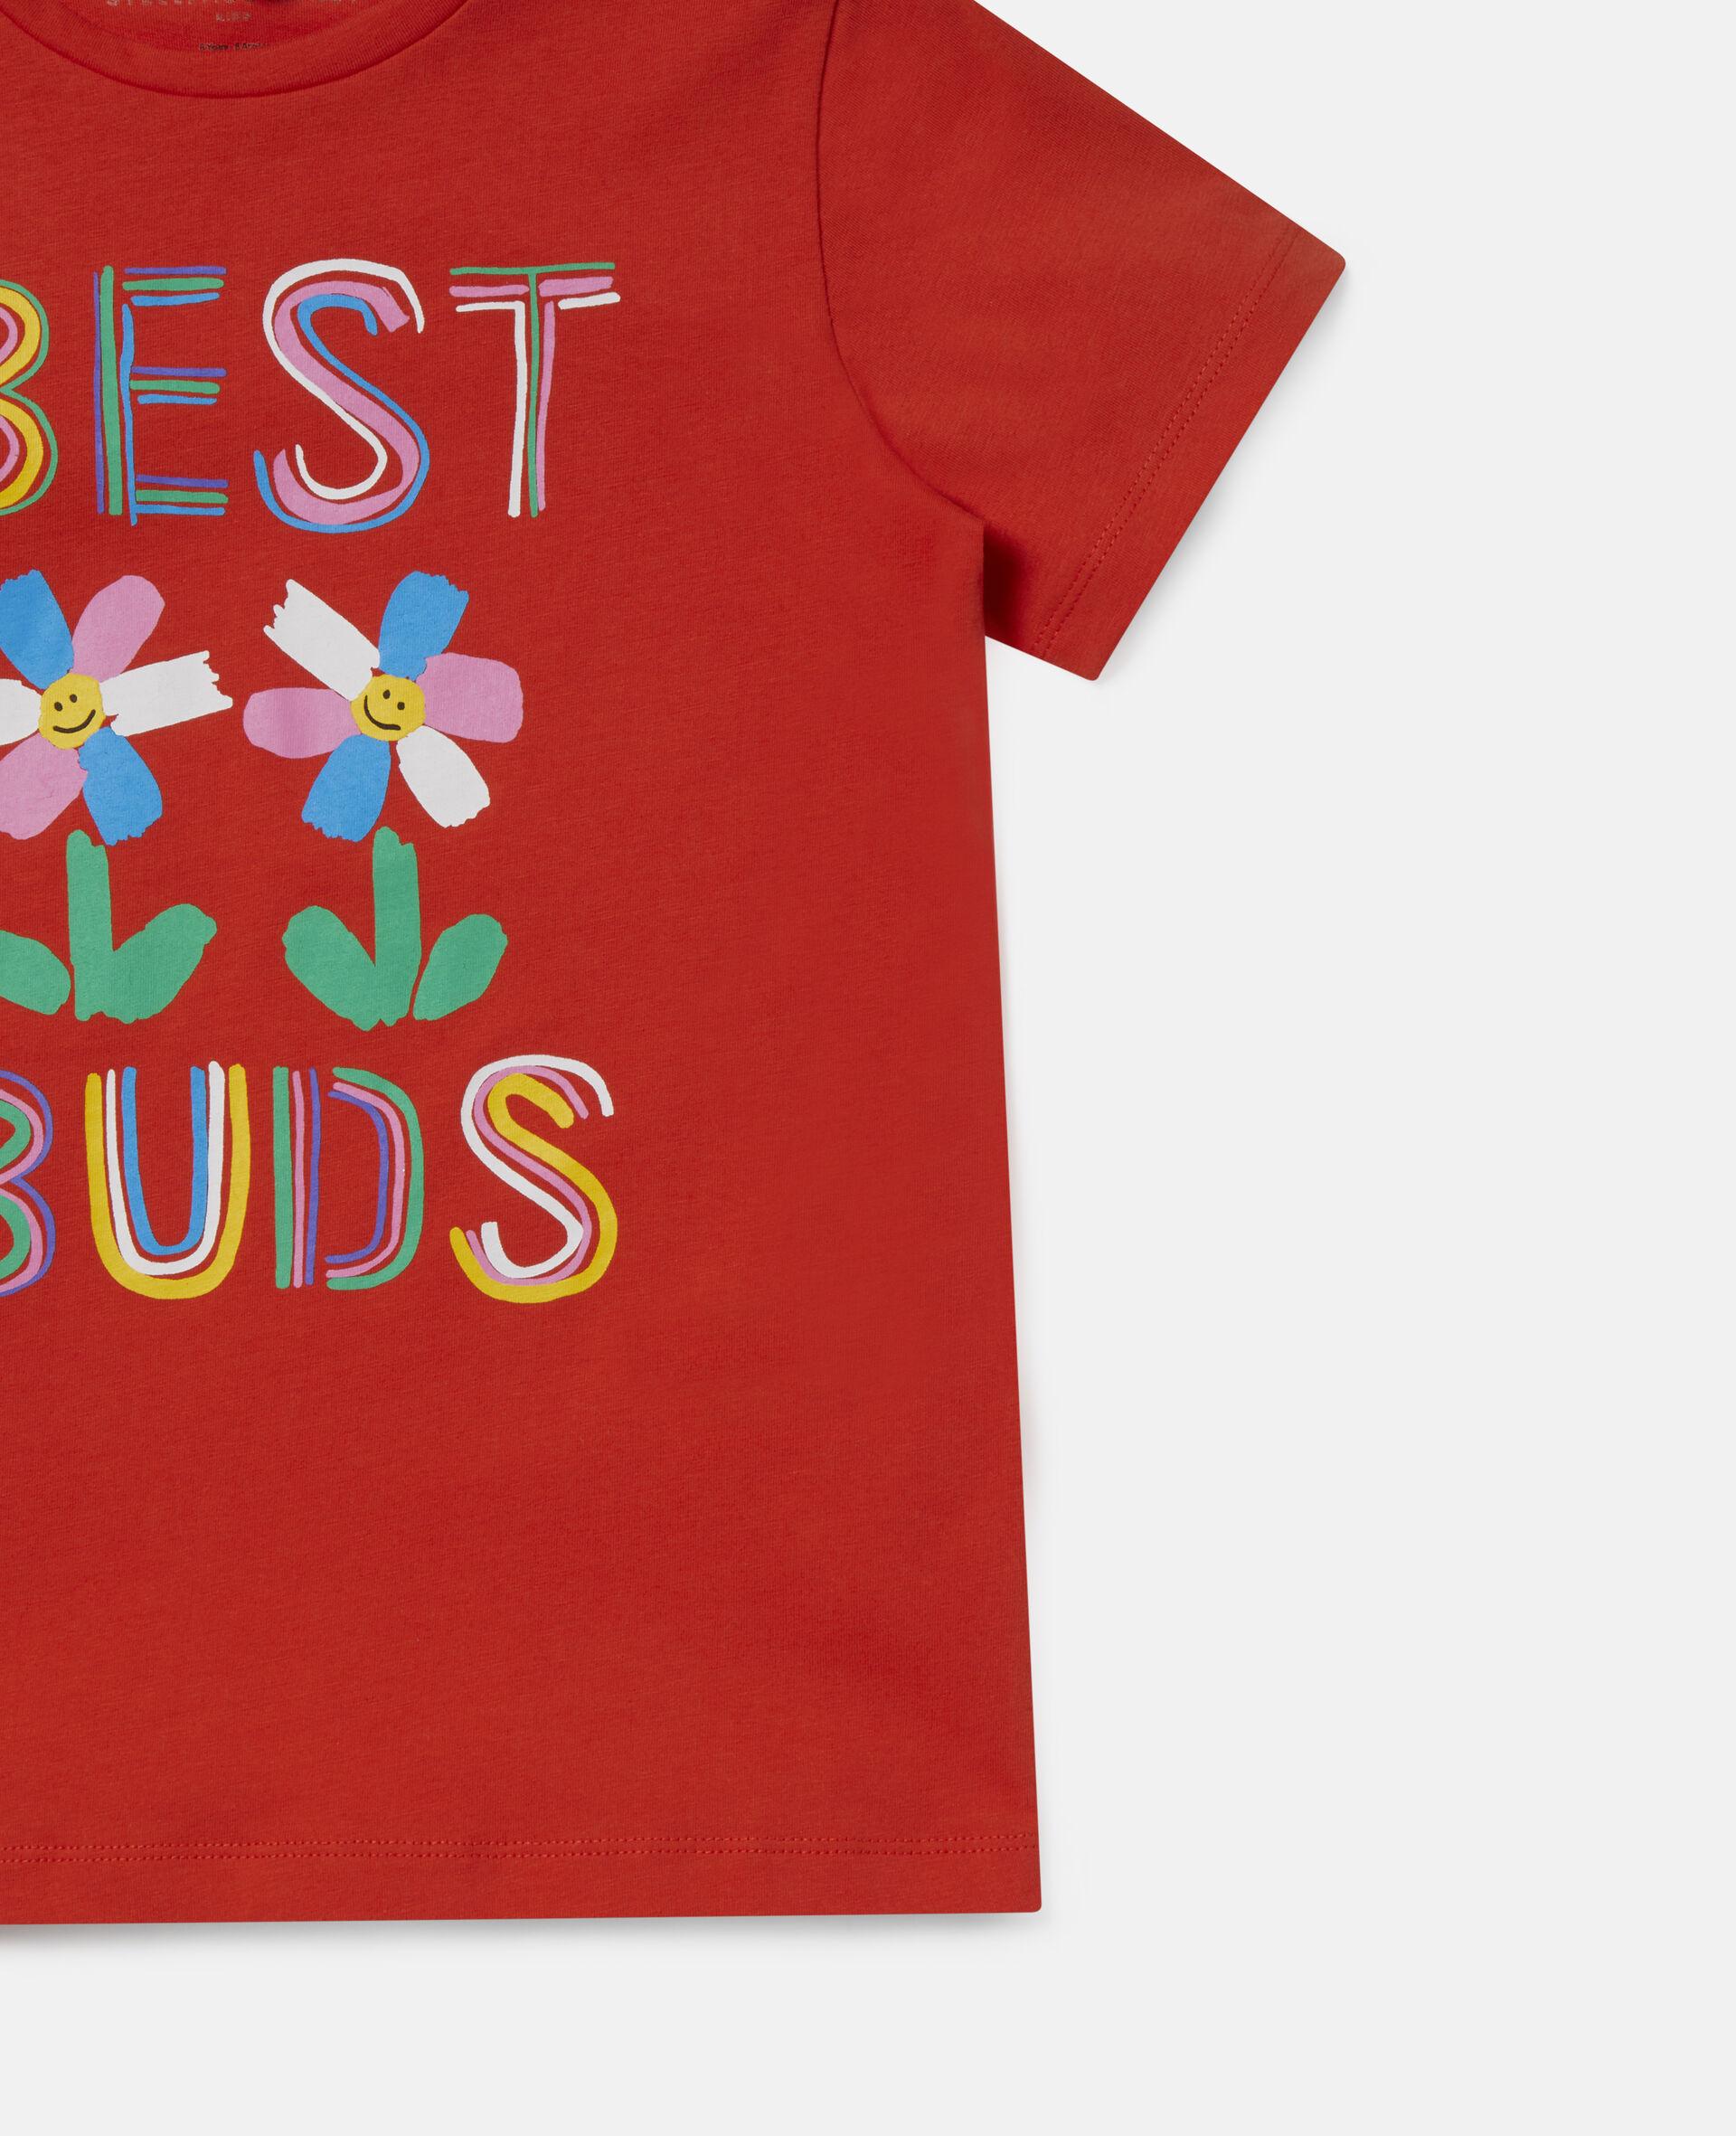 Best Buds 印花棉质 T 恤-红色-large image number 1